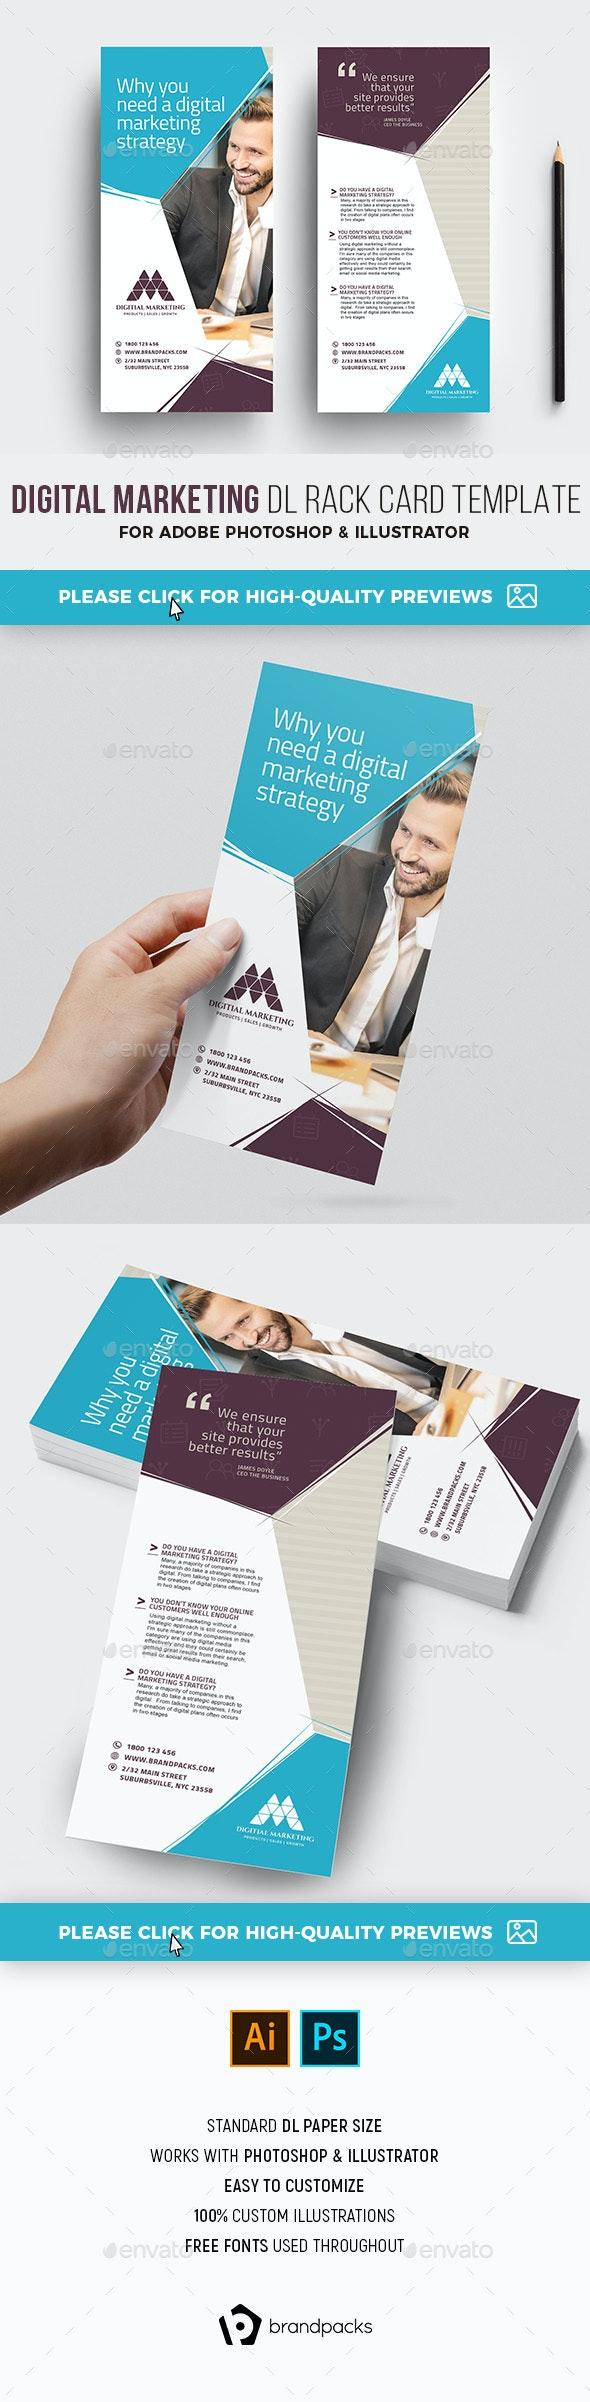 Digital Marketing DL Rack Card Template - Corporate Flyers